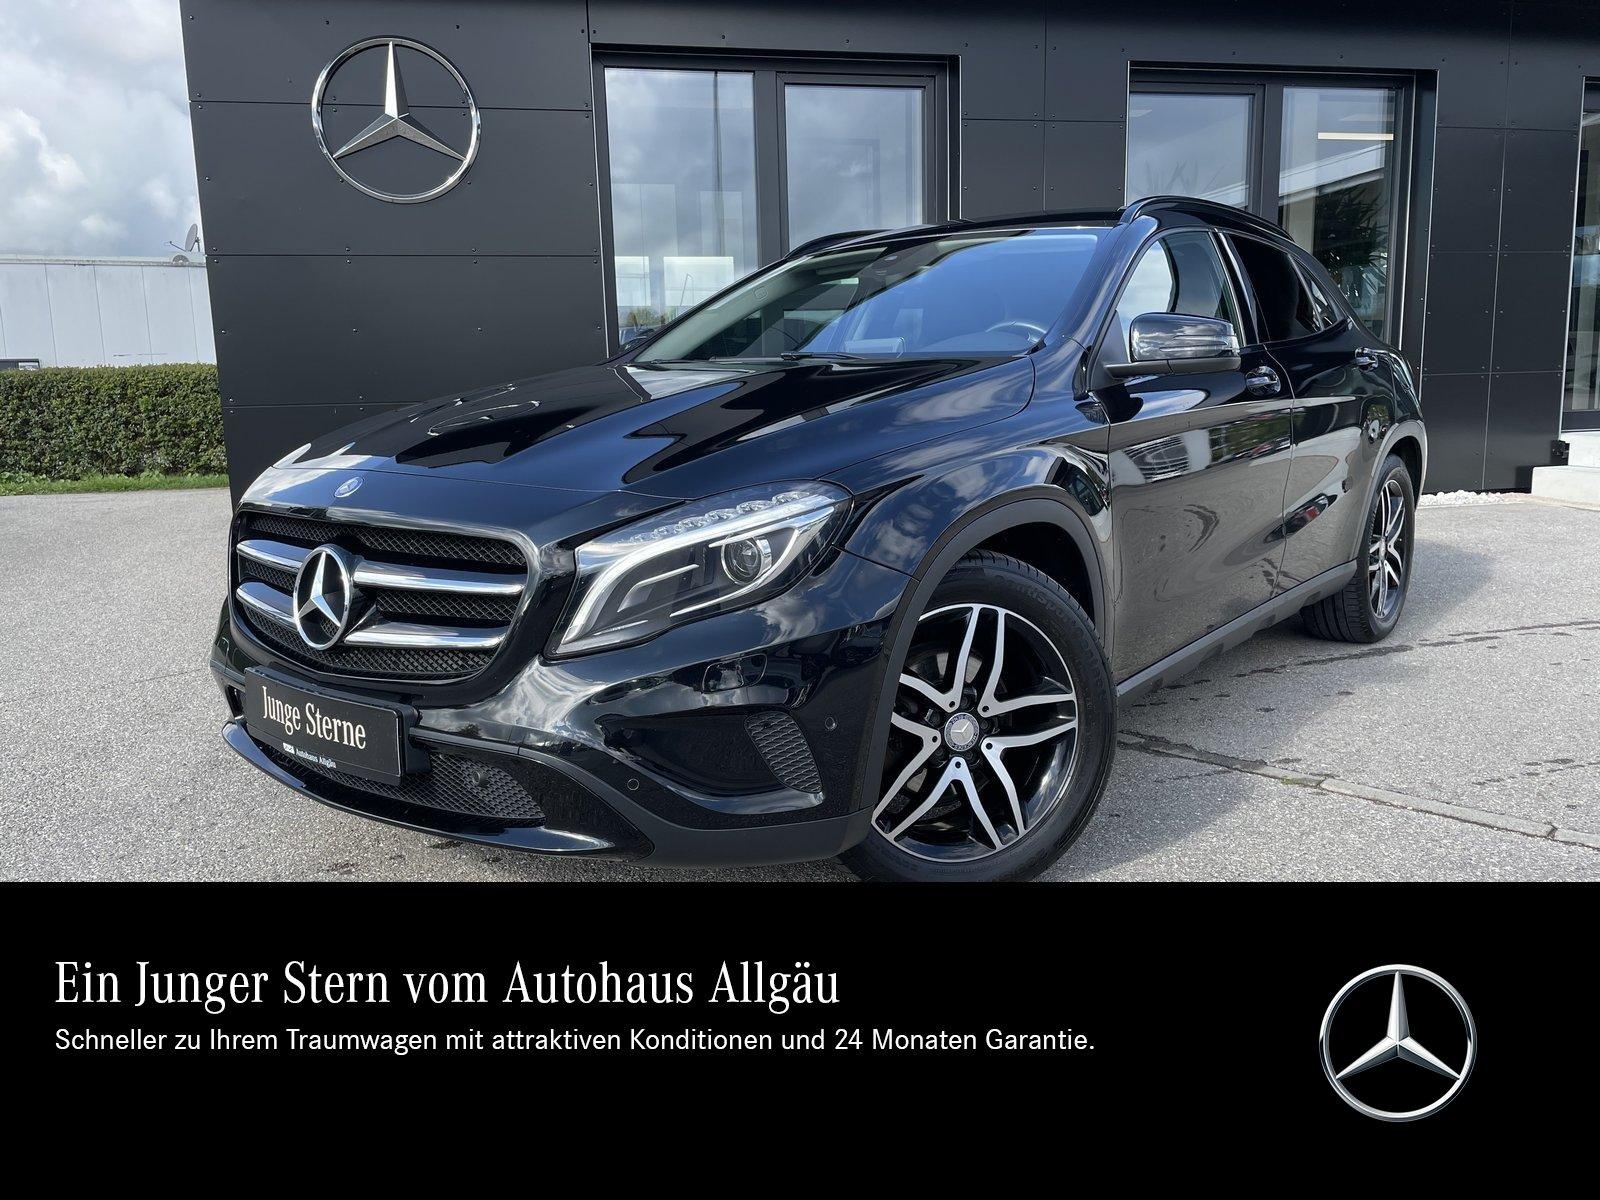 Mercedes-Benz GLA 220 d URBAN+AHK+KAMERA+HARMAN+XENON+NIGHT+SH, Jahr 2015, Diesel